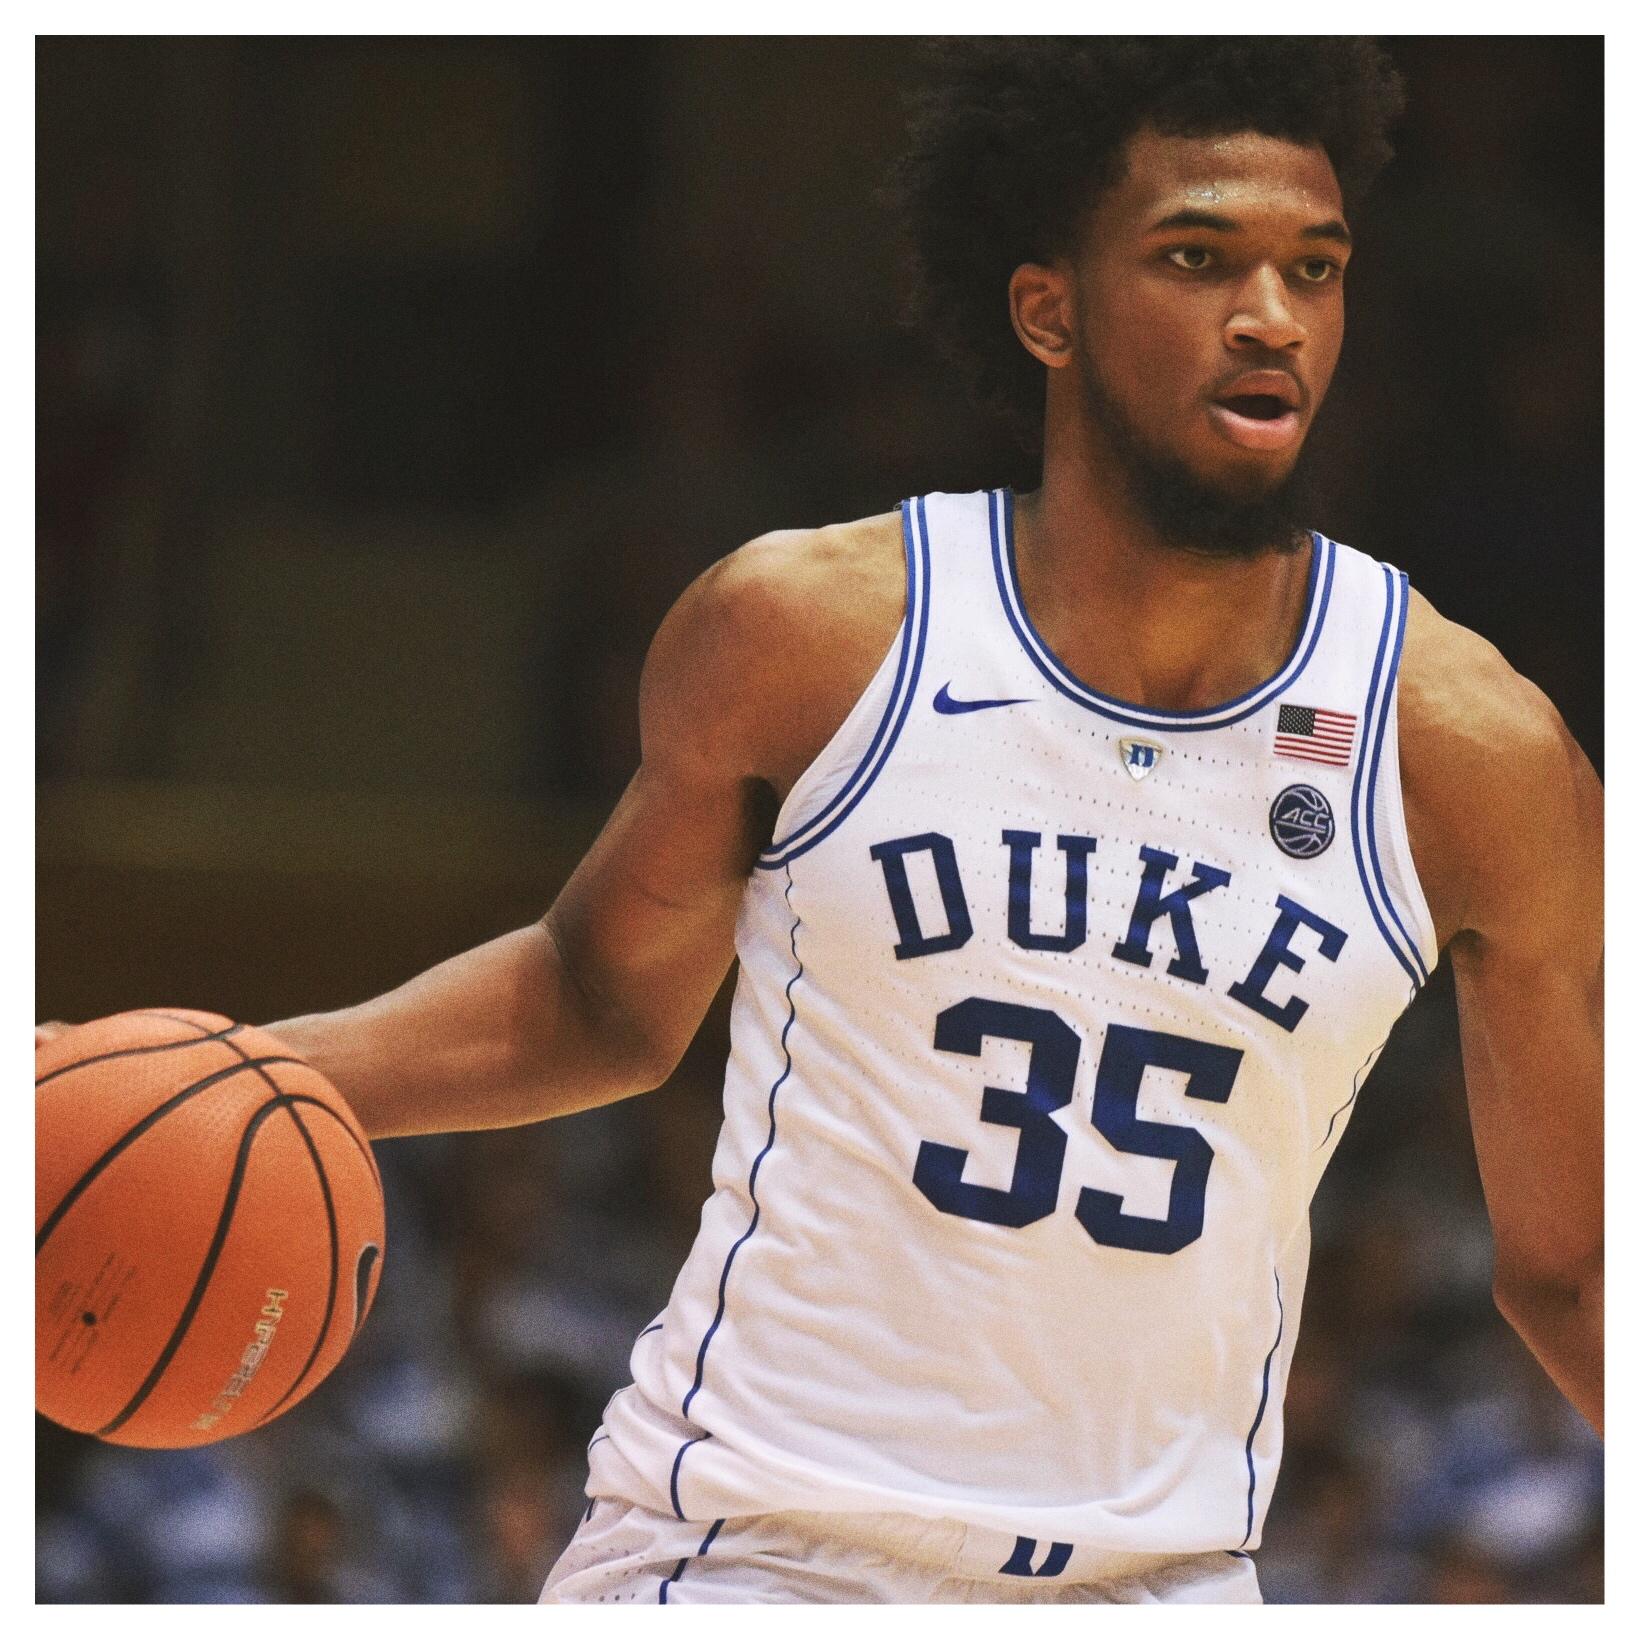 MARVIN BAGLEY III - F/C•6'11, 220•Duke•Freshman